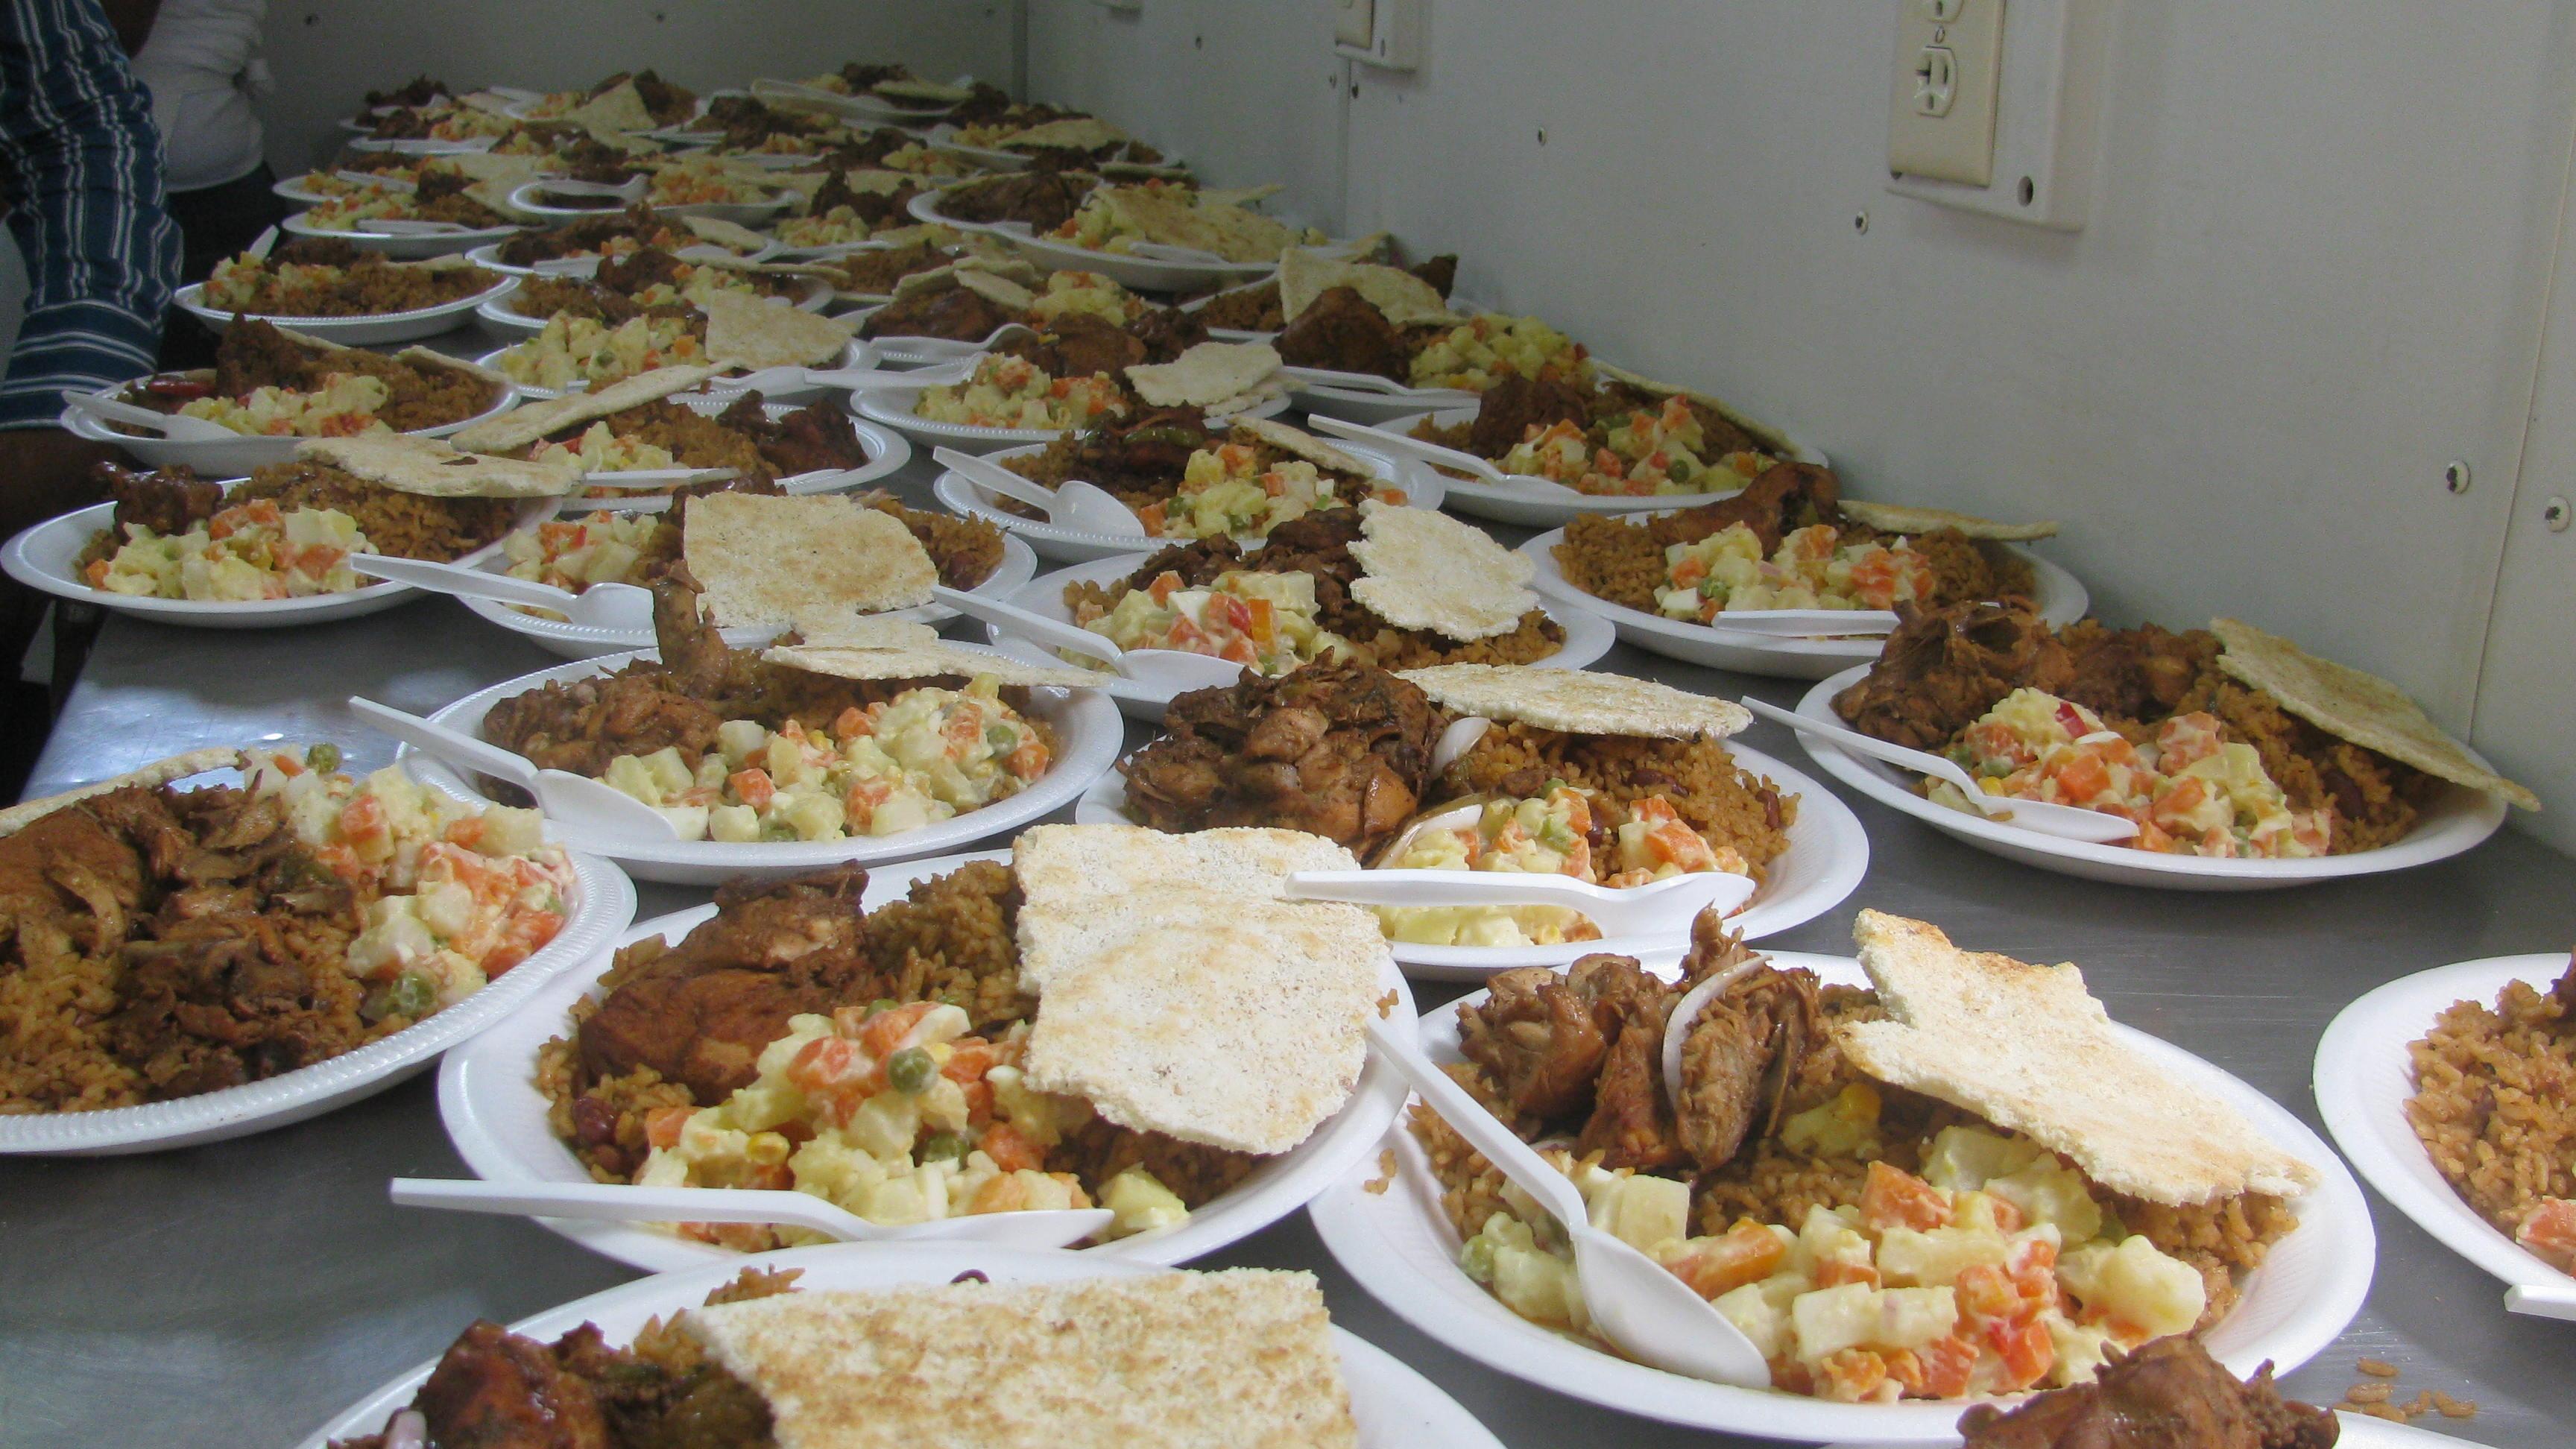 Comedores  suministra alimentos a familias afectadas por lluvias